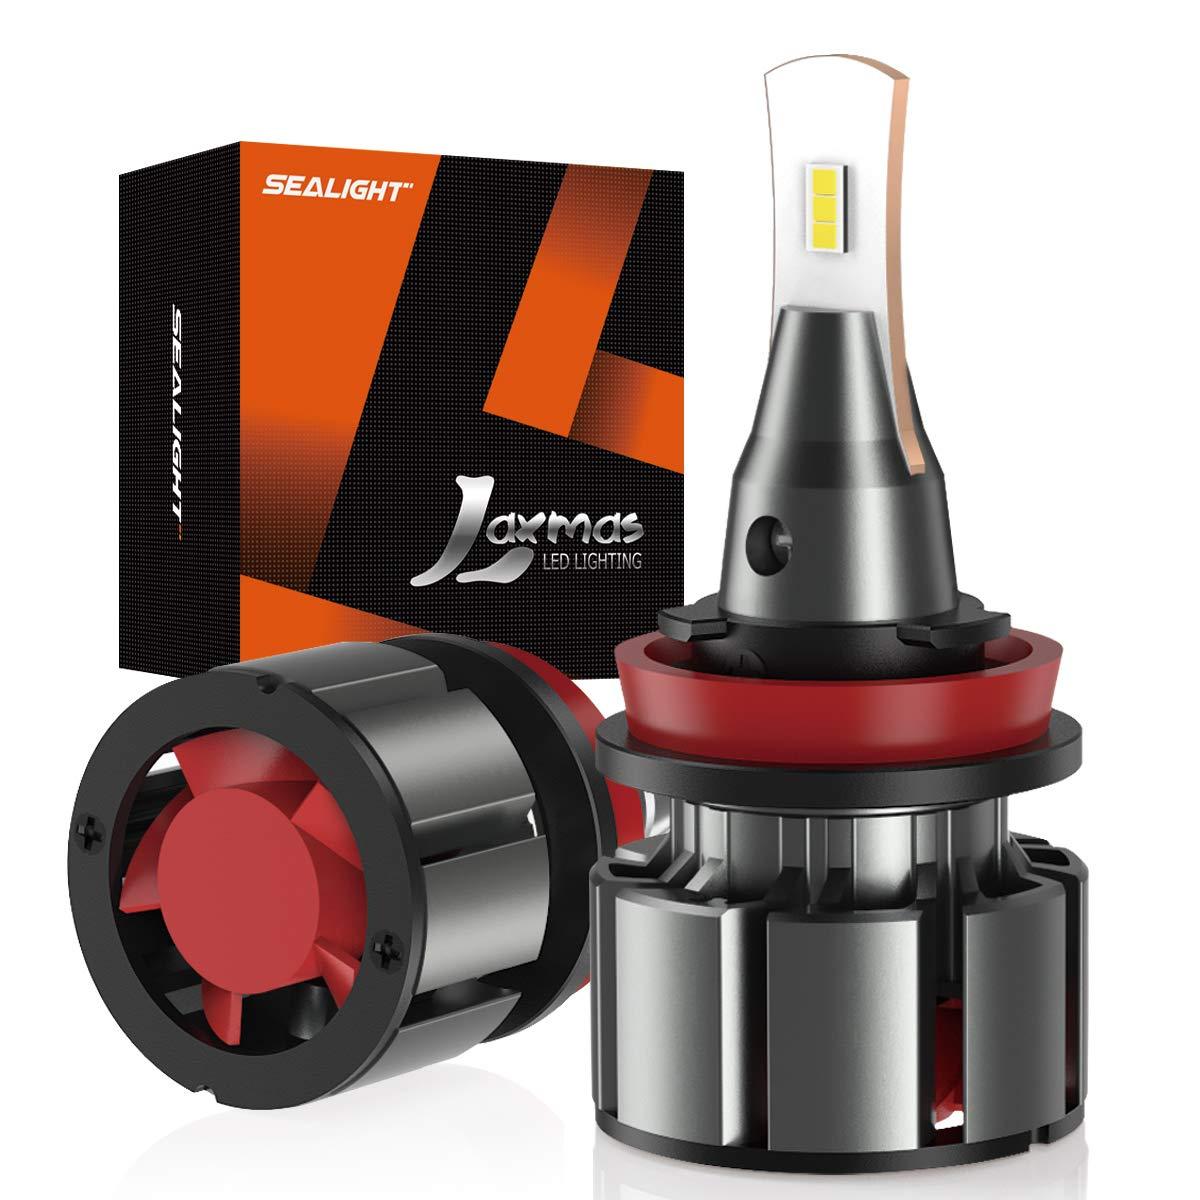 SEALIGHT Car Lights H7 LED Headlamp 15000LM 80W for Car led Headlight Bulb with 2pcs Resistor CSP Turbo LED Bulbs H1 Car Lamps